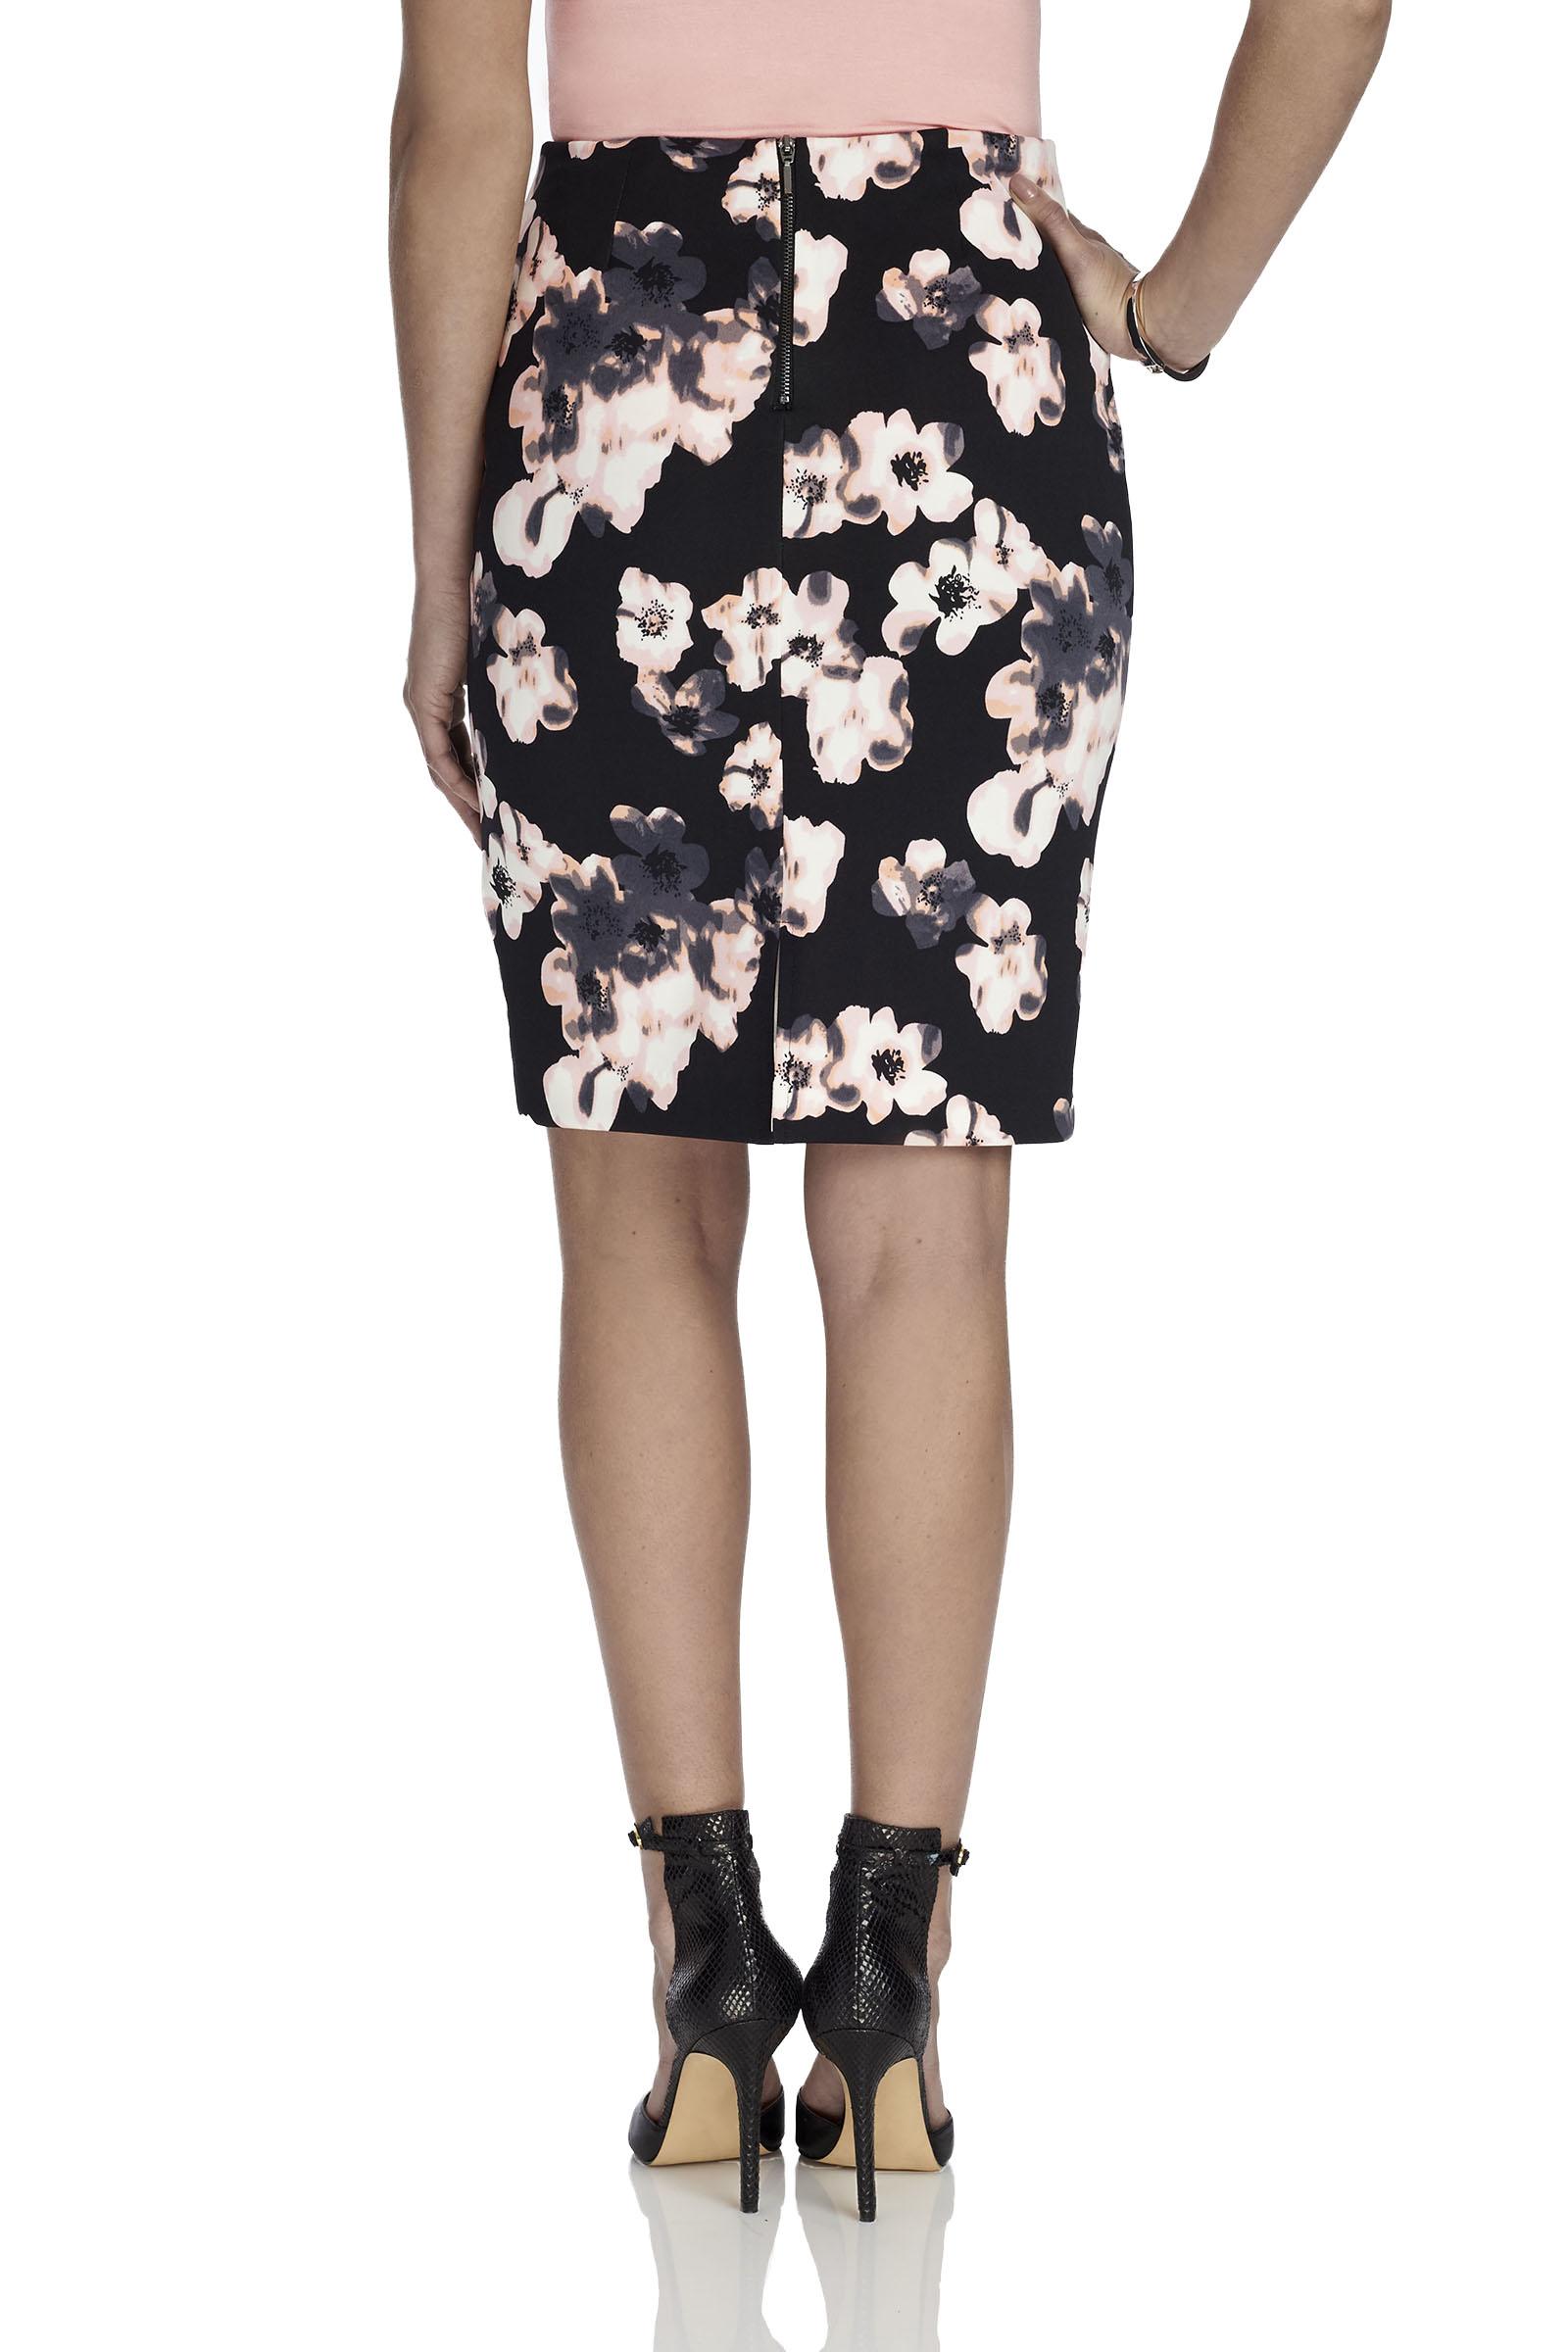 trisisto floral print pencil skirt free shipping